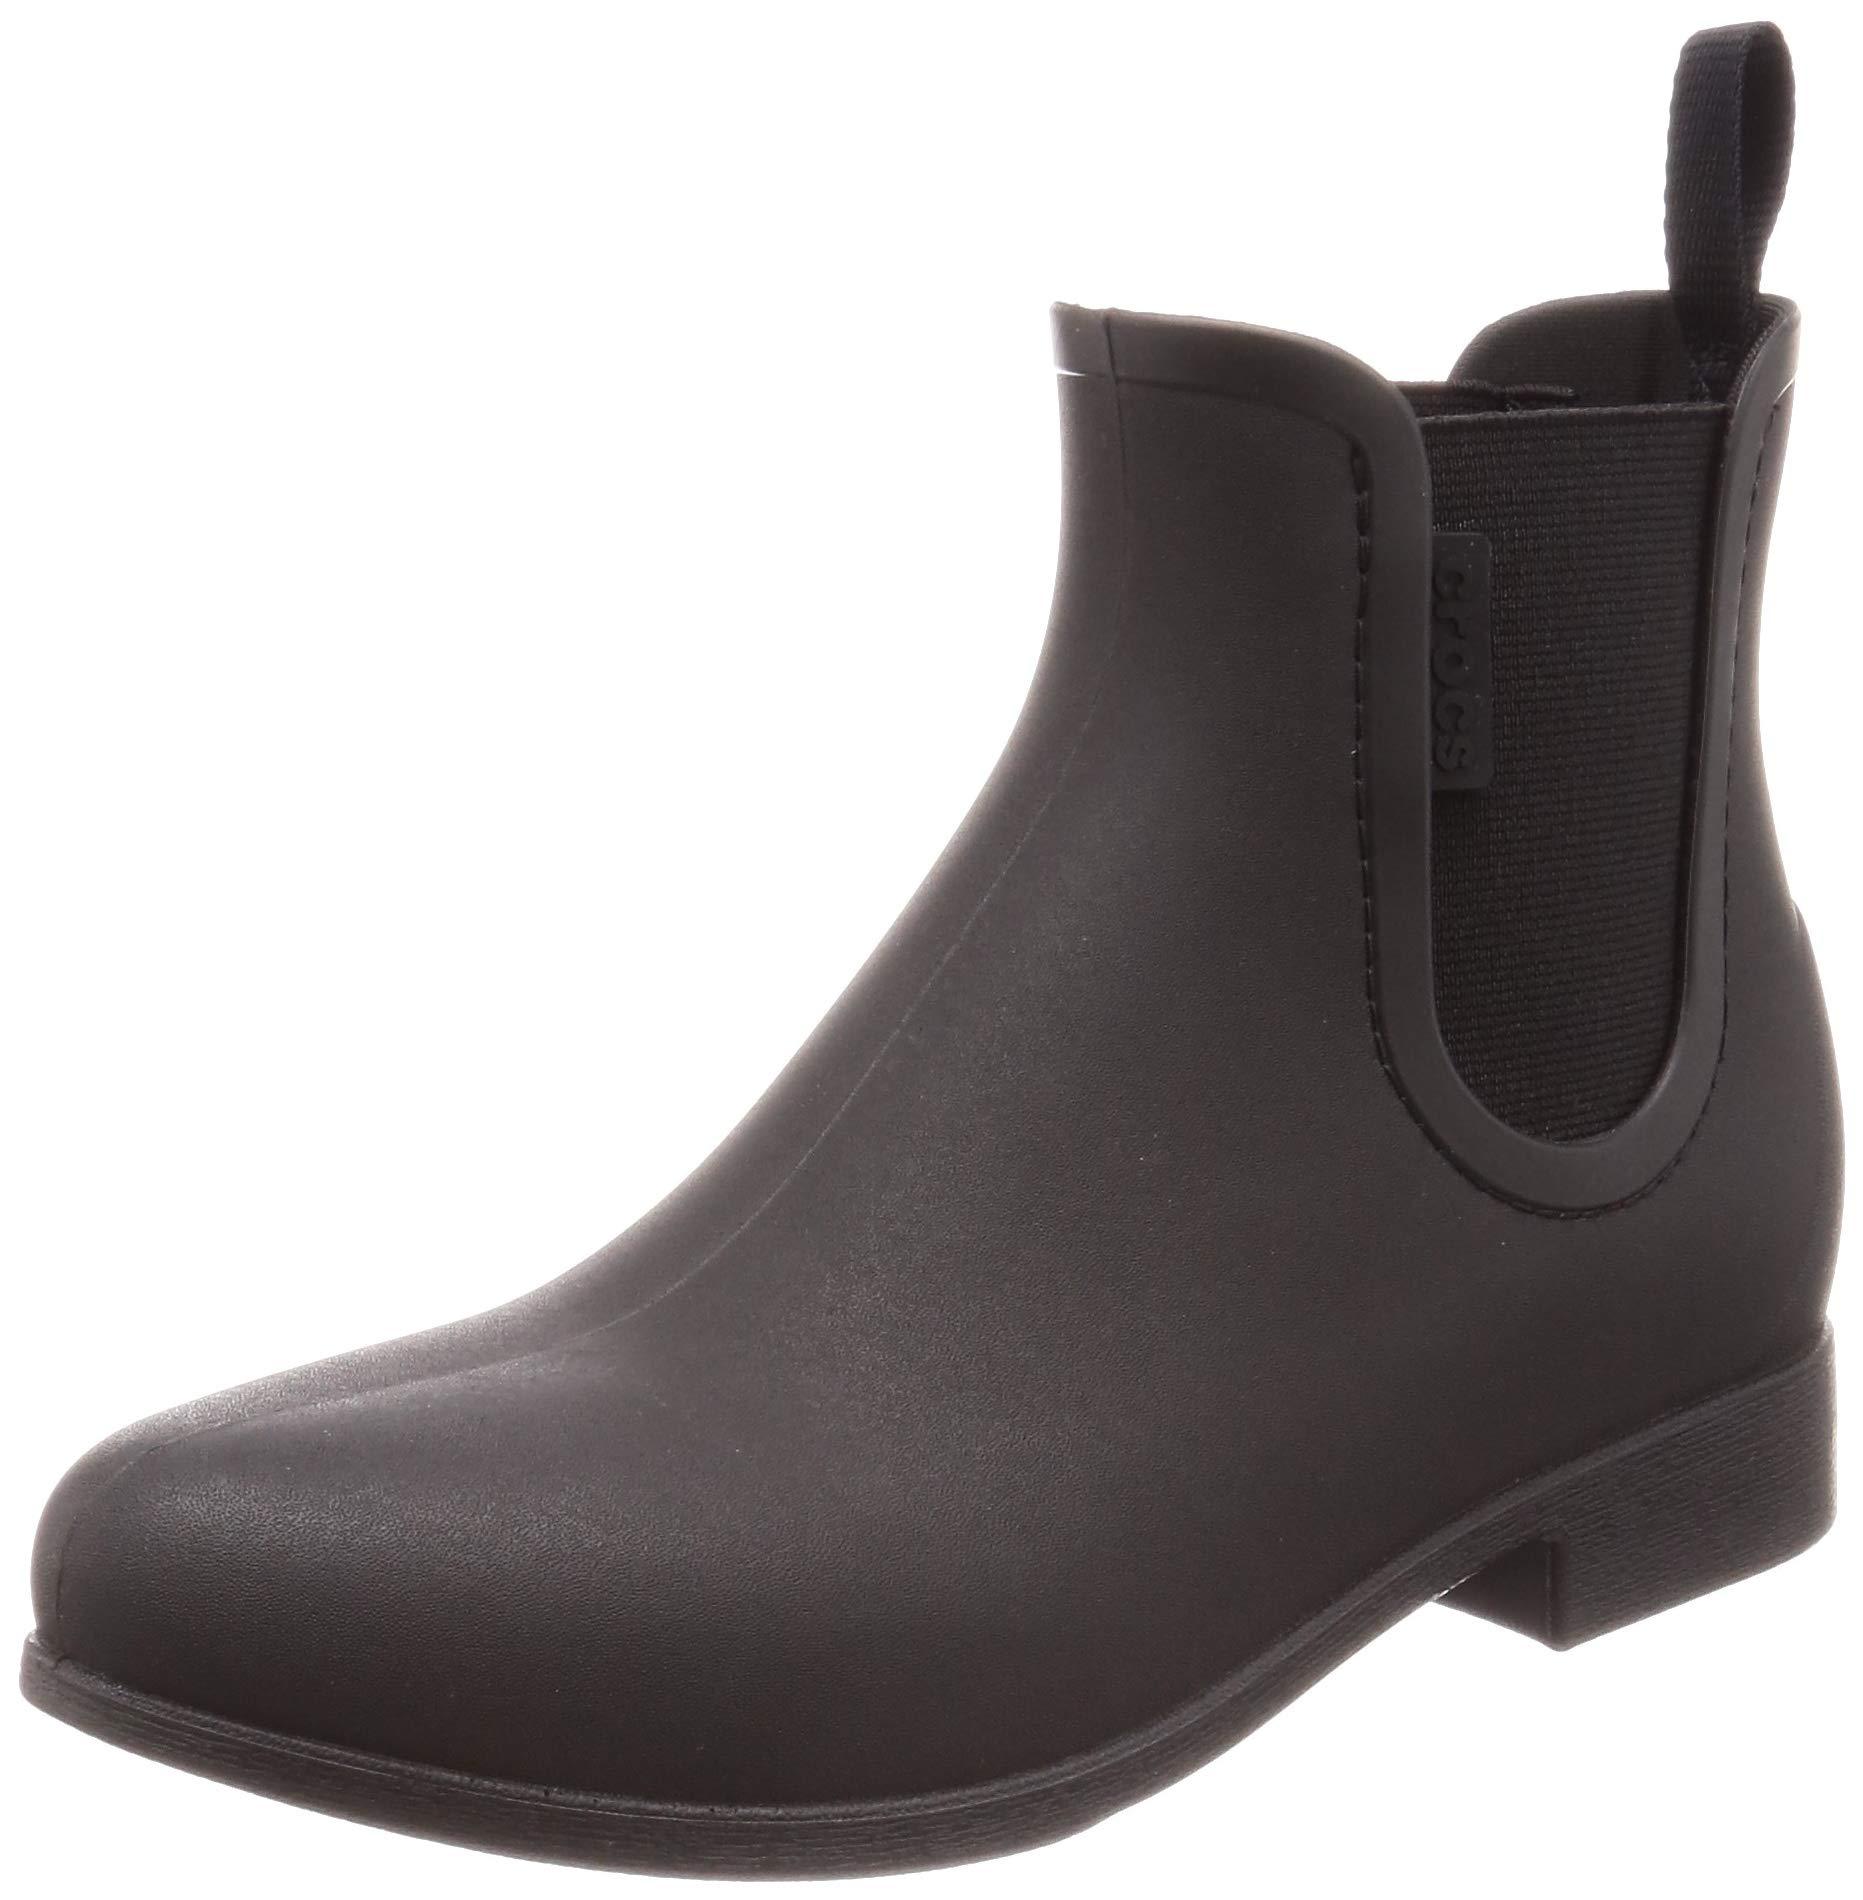 Crocs Women's Leigh Chelsea Rain Boot Black, 10 M US by Crocs